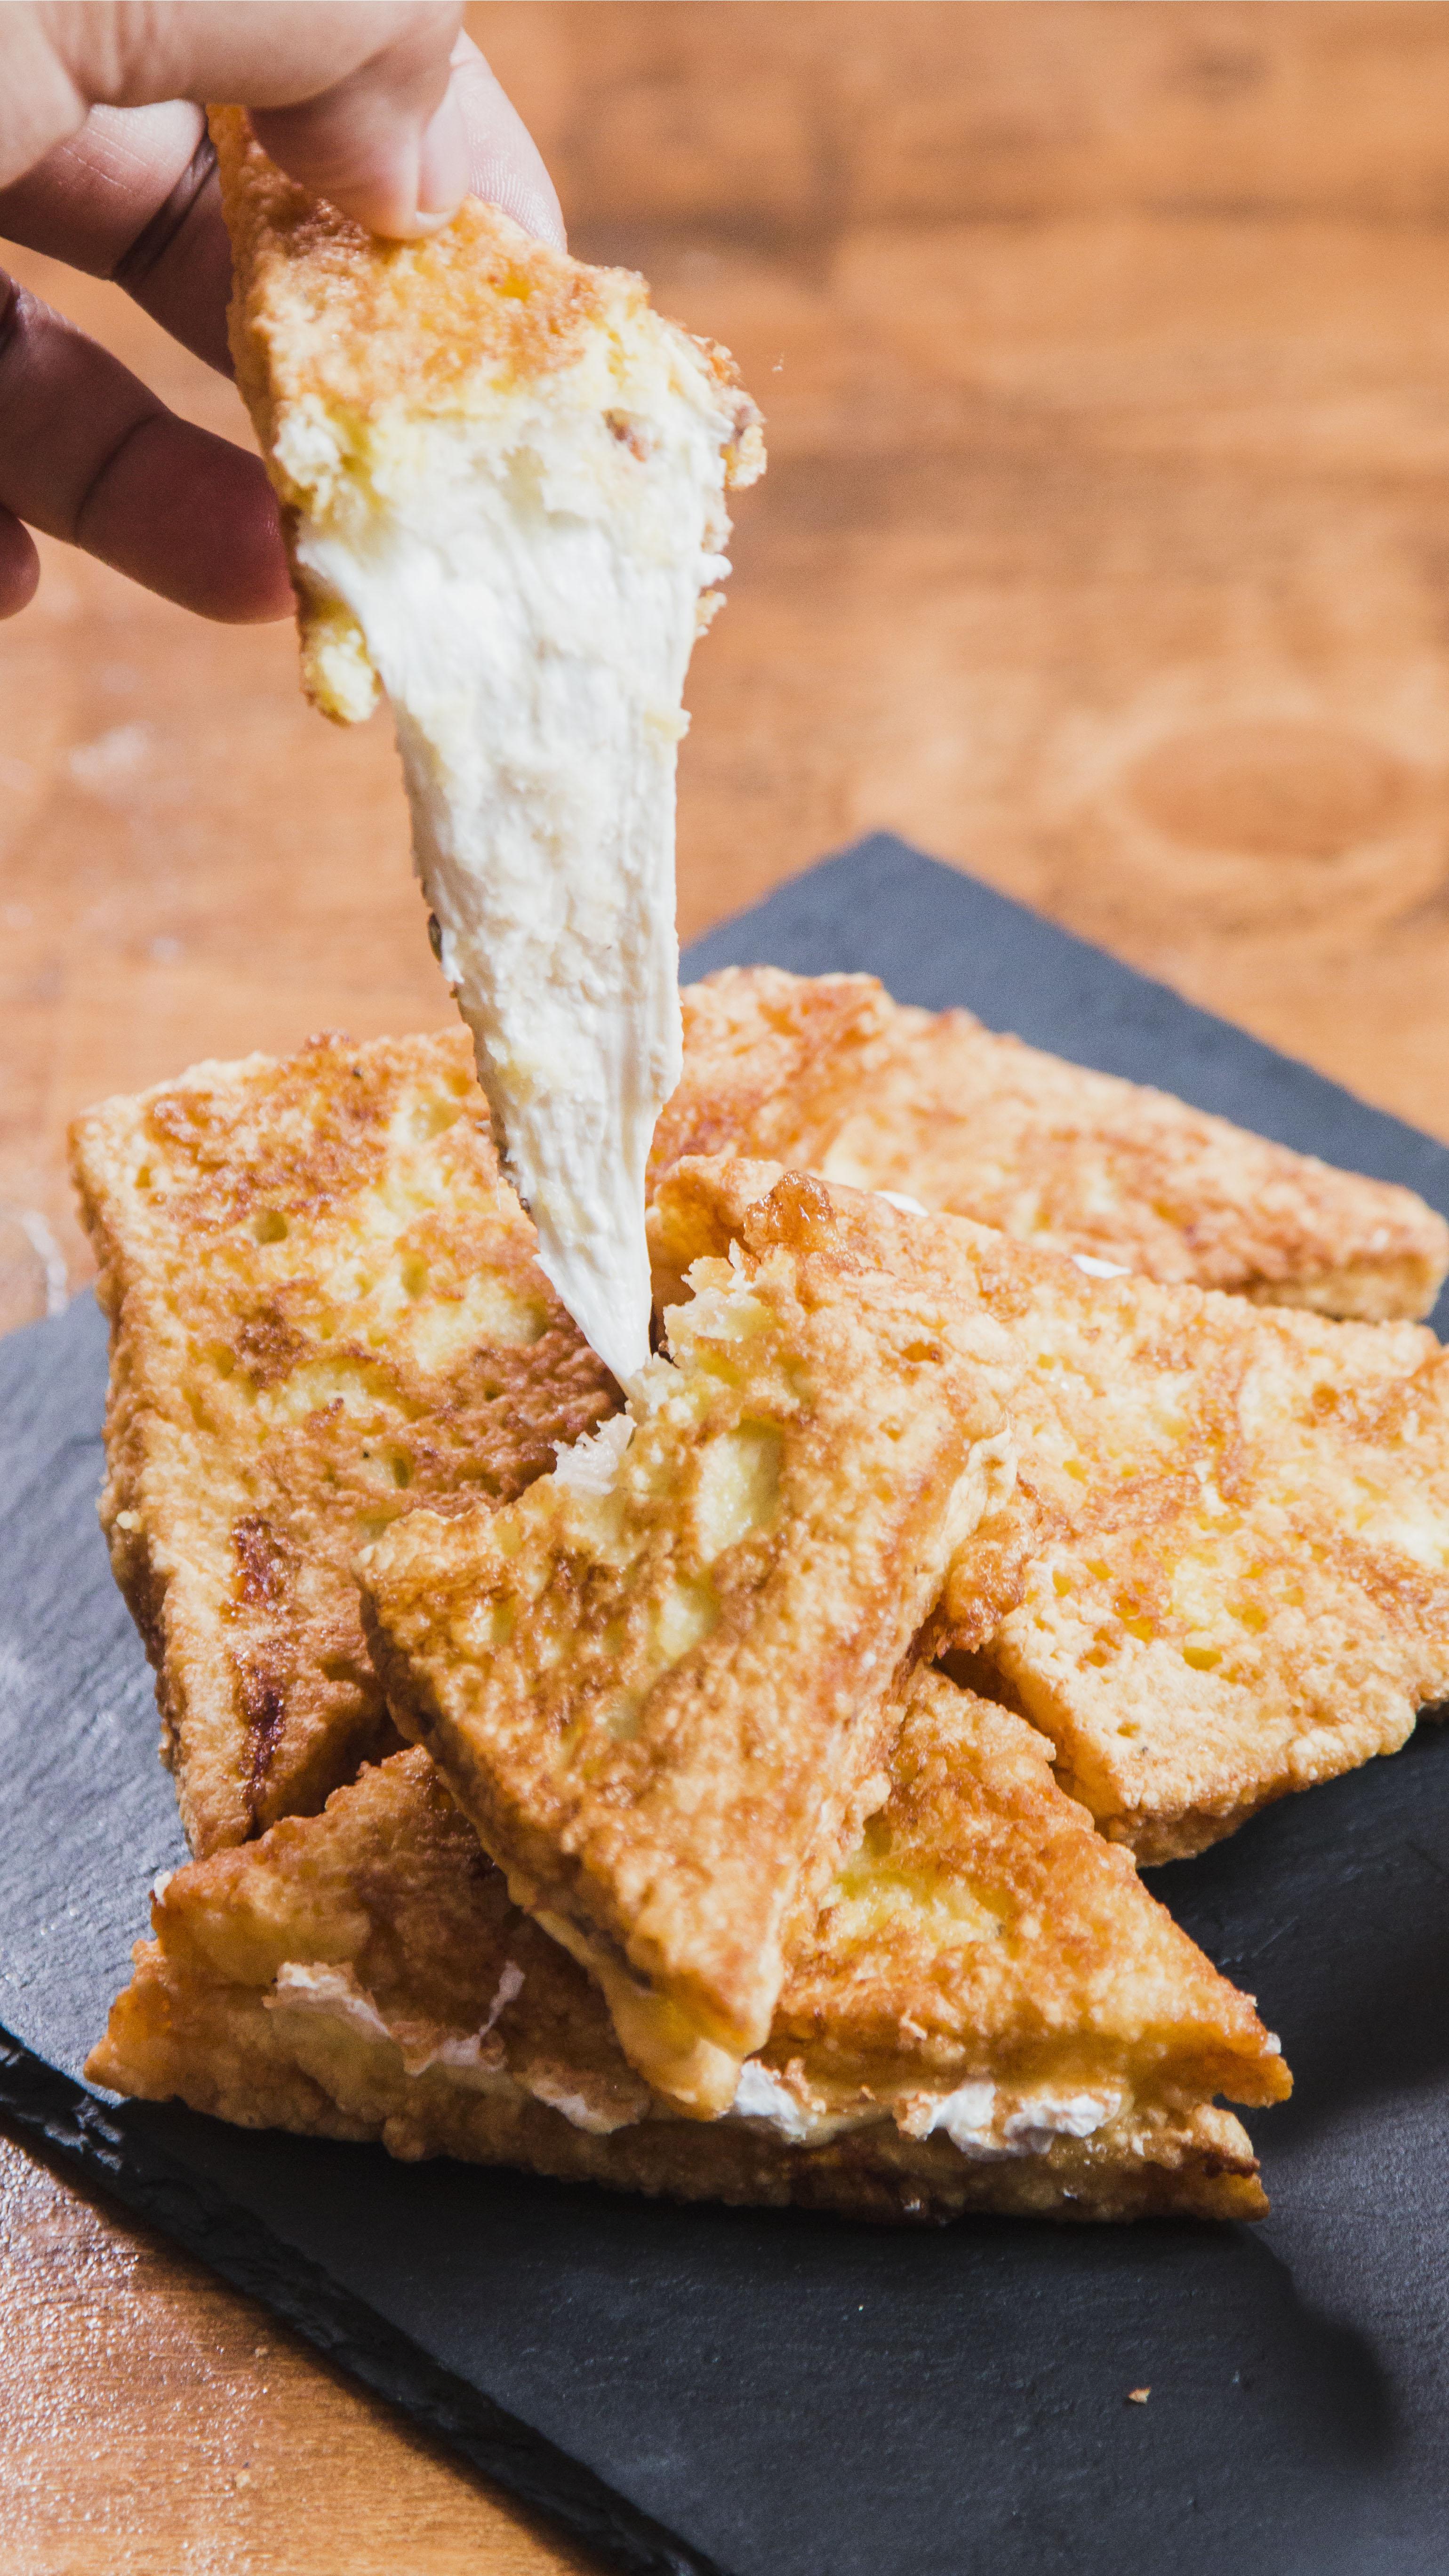 Mozzarella en Carrozza ~ Recipe Tastemade